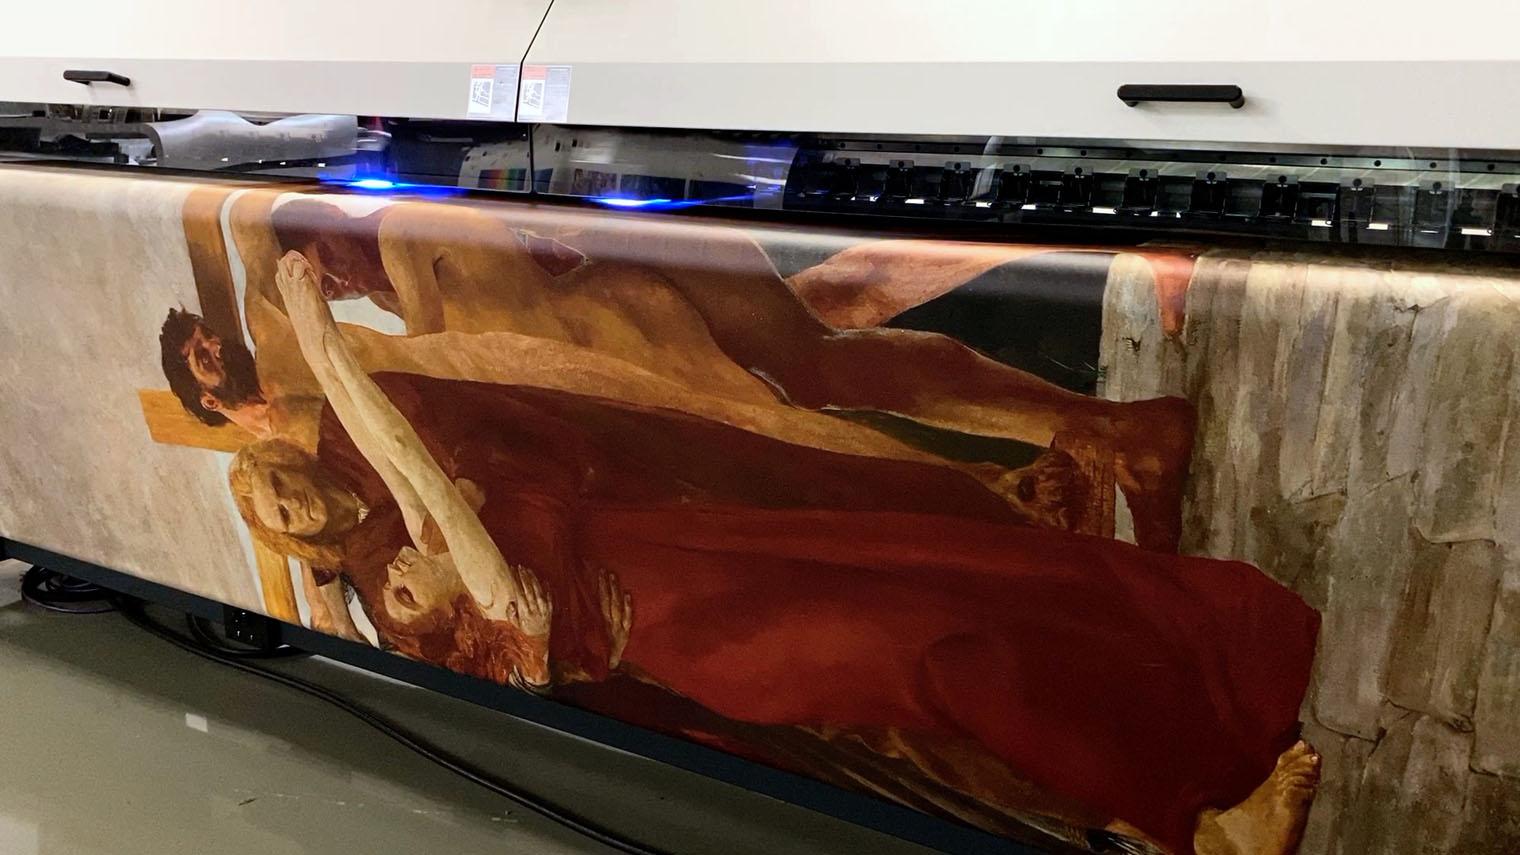 Kunstprojekt Augmented Reality Mimika Großformatdruck